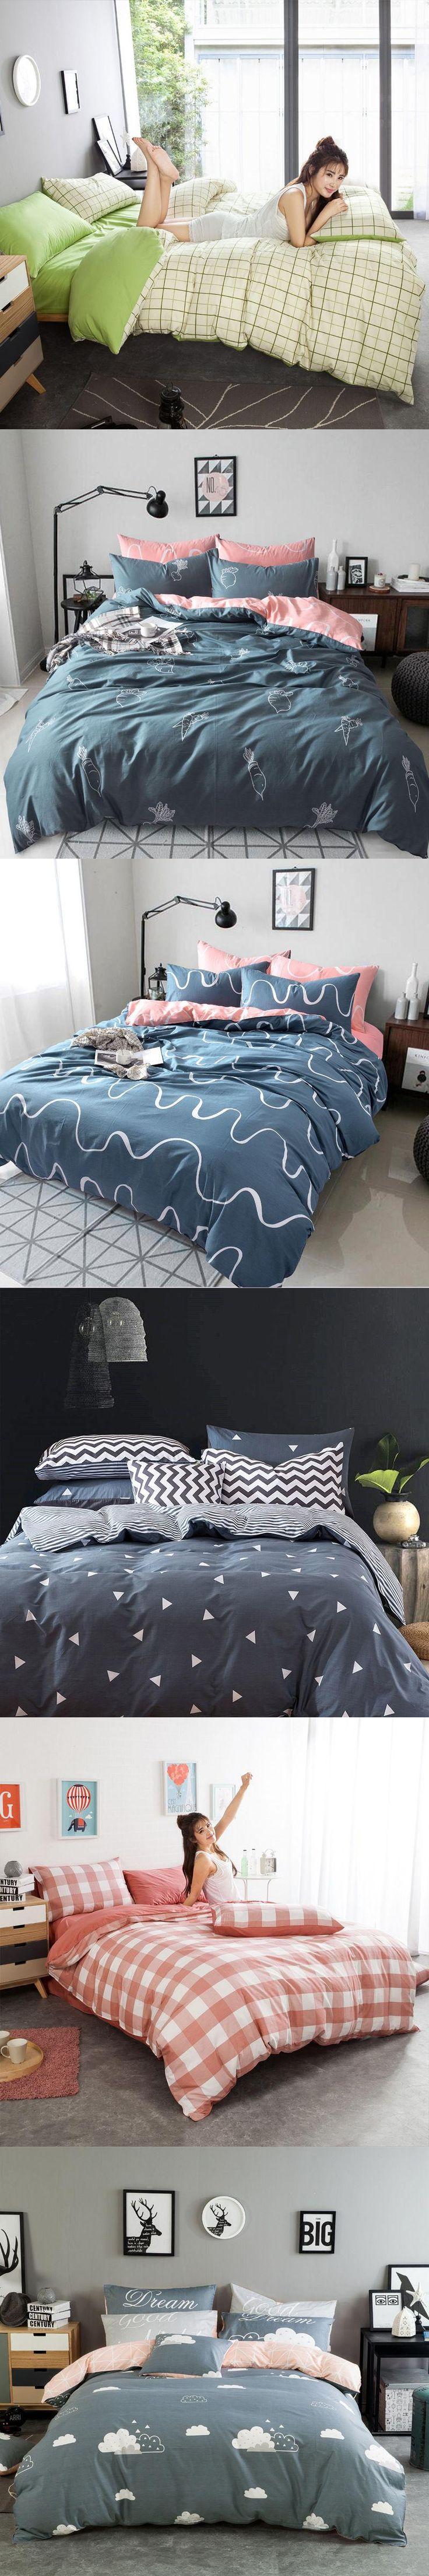 1233 best Home Textile images on Pinterest